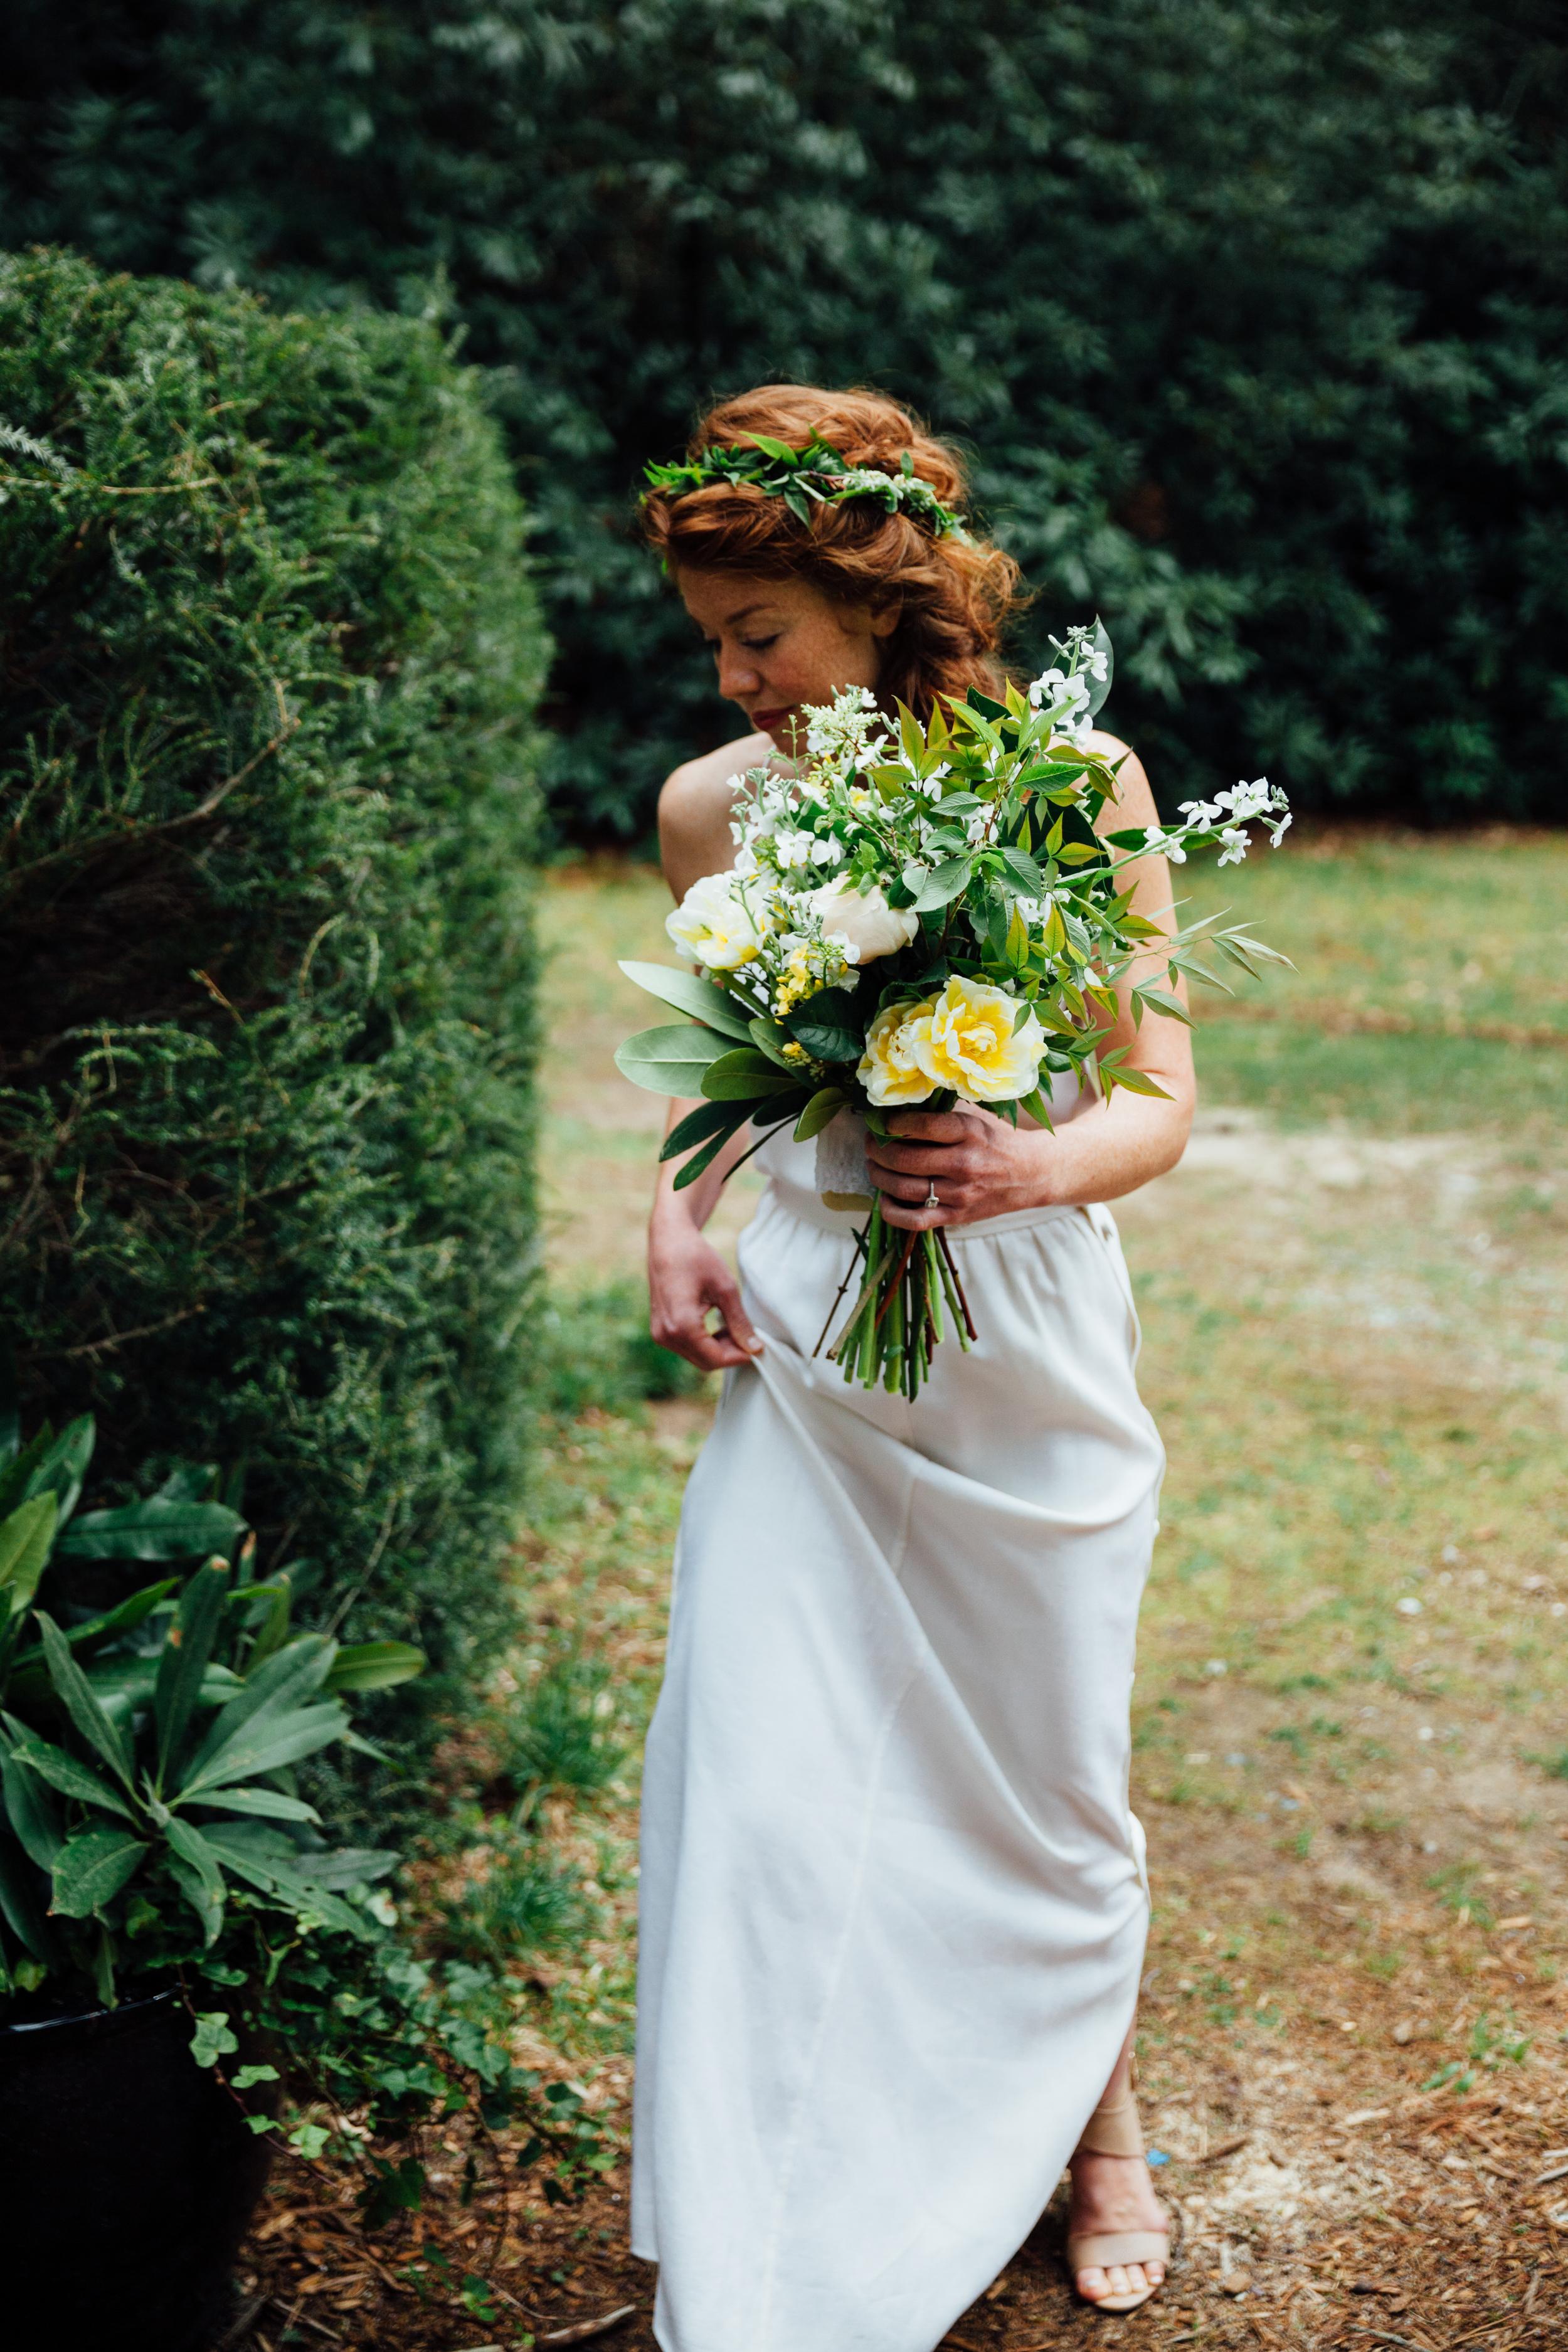 Christina-Hussey-Photography-222.jpg